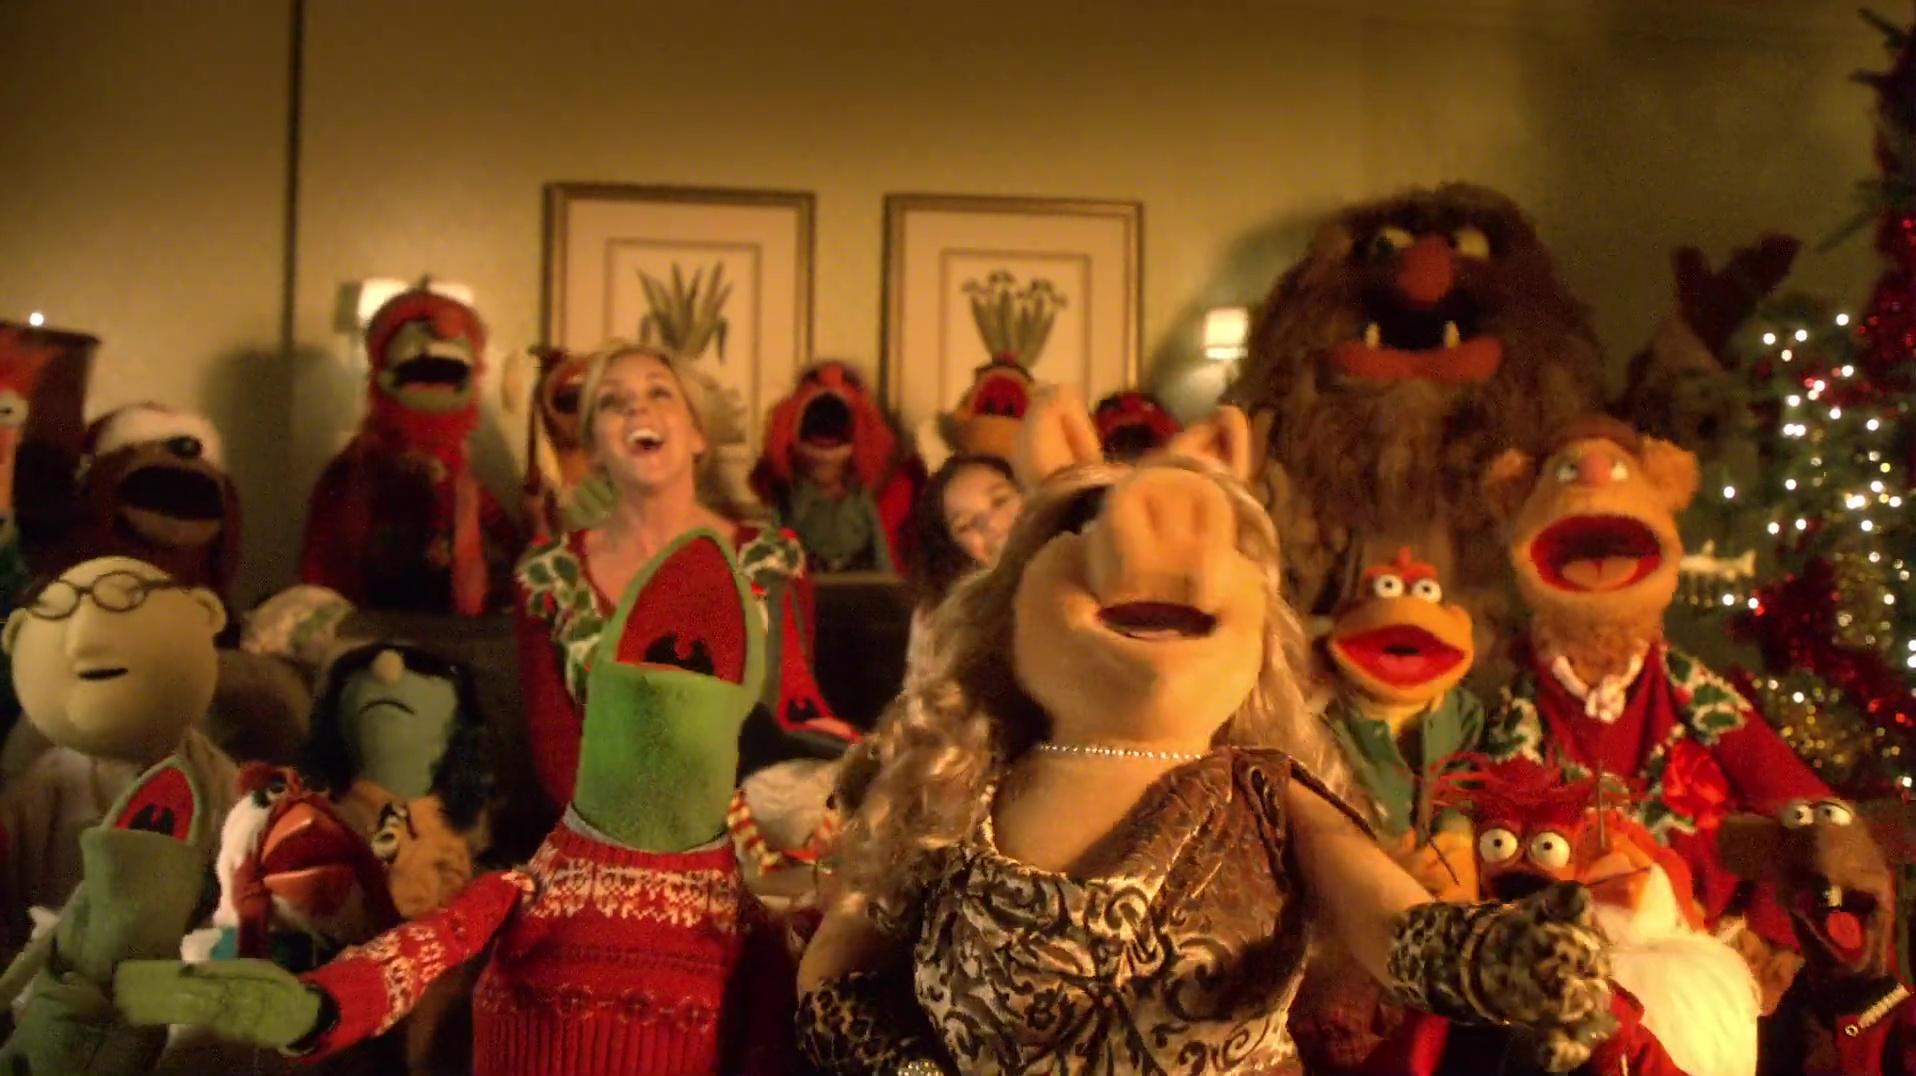 My Best Christmas Yet | Muppet Wiki | FANDOM powered by Wikia